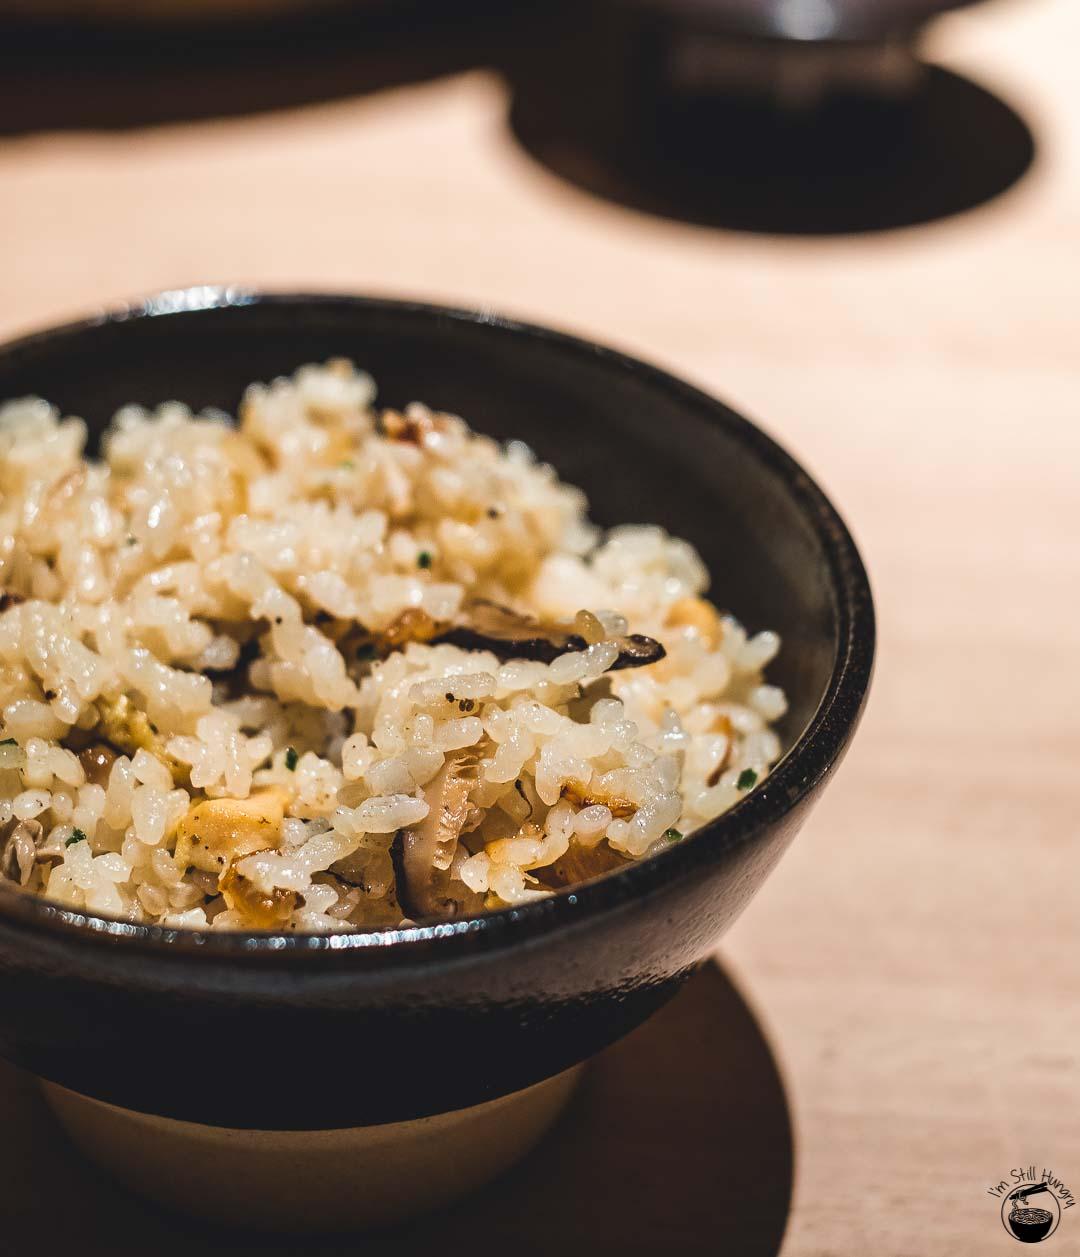 Restaurant Sasaki Surry Hills Second Visit-9 Rice, chicken & mushroom